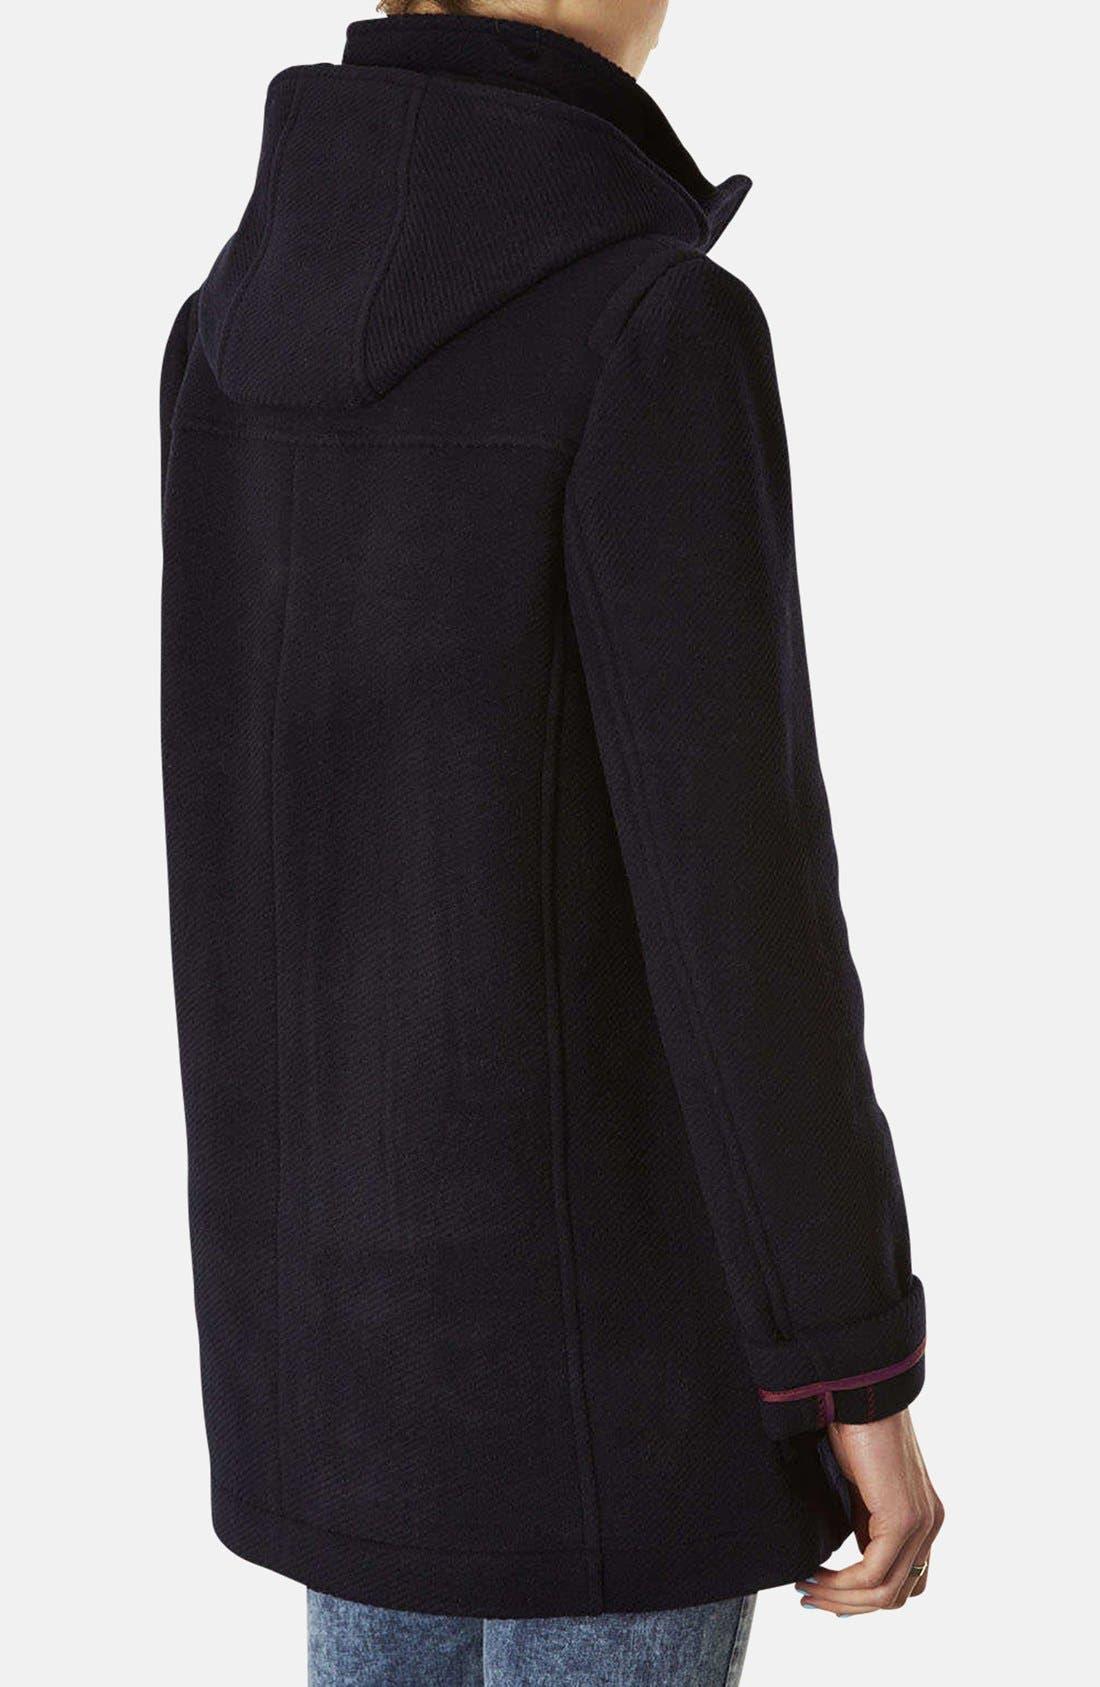 TOPSHOP, Hooded Toggle Duffle Coat, Alternate thumbnail 4, color, 410